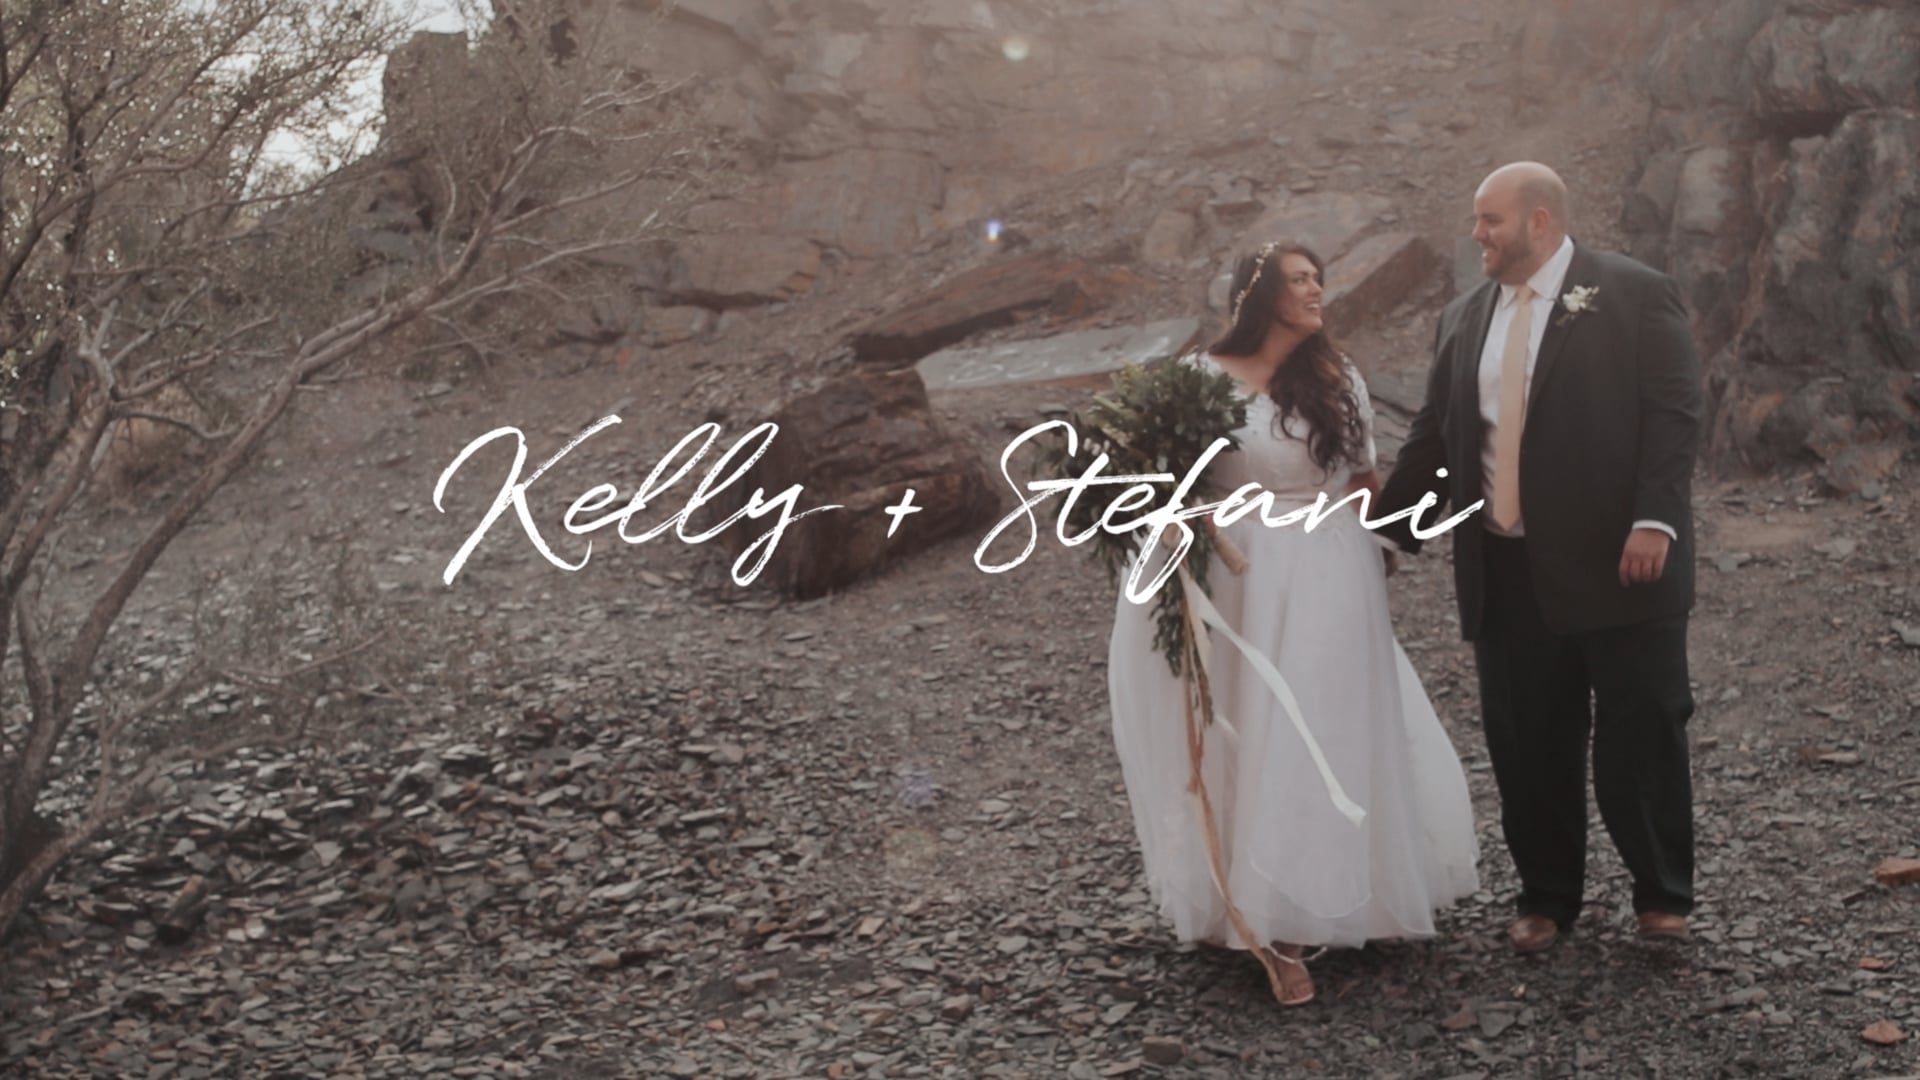 Kelly + Stefani // First Look